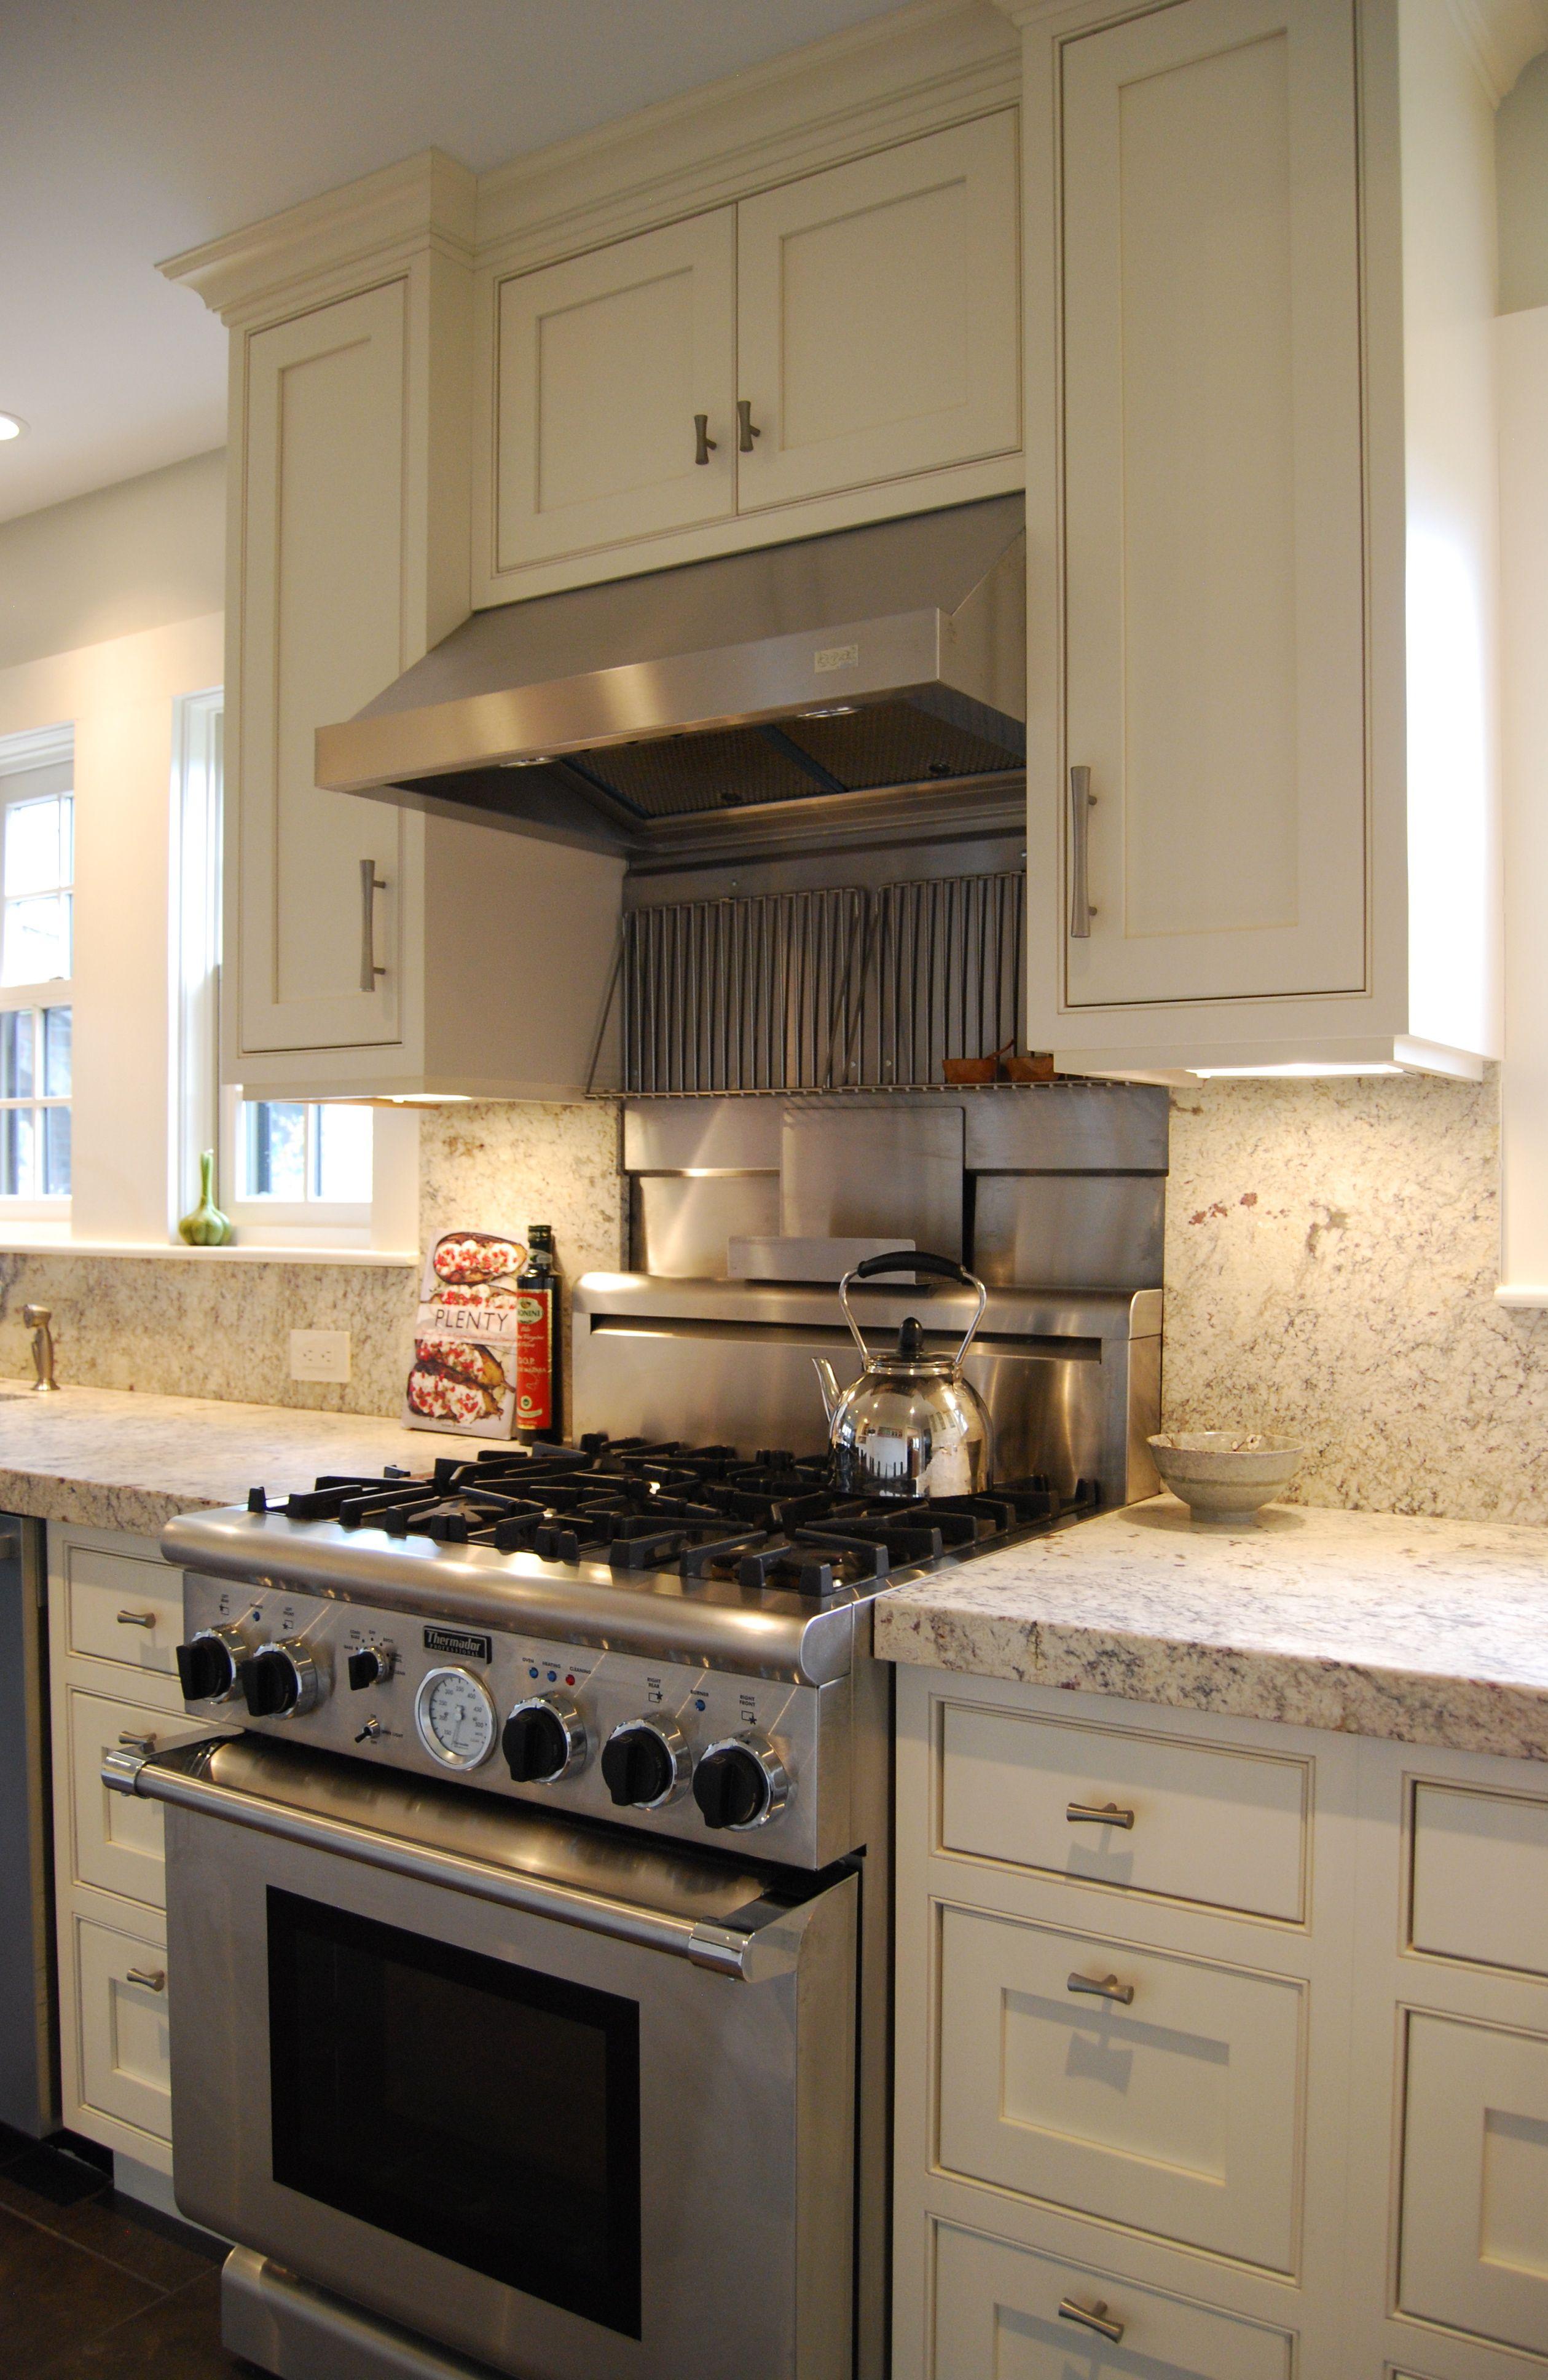 Kitchen Thermador Oven Adelphi Custom Cabinets Honed Bianco Romano Backsplash And Kitchen Countertops Replacing Kitchen Countertops Diy Kitchen Countertops